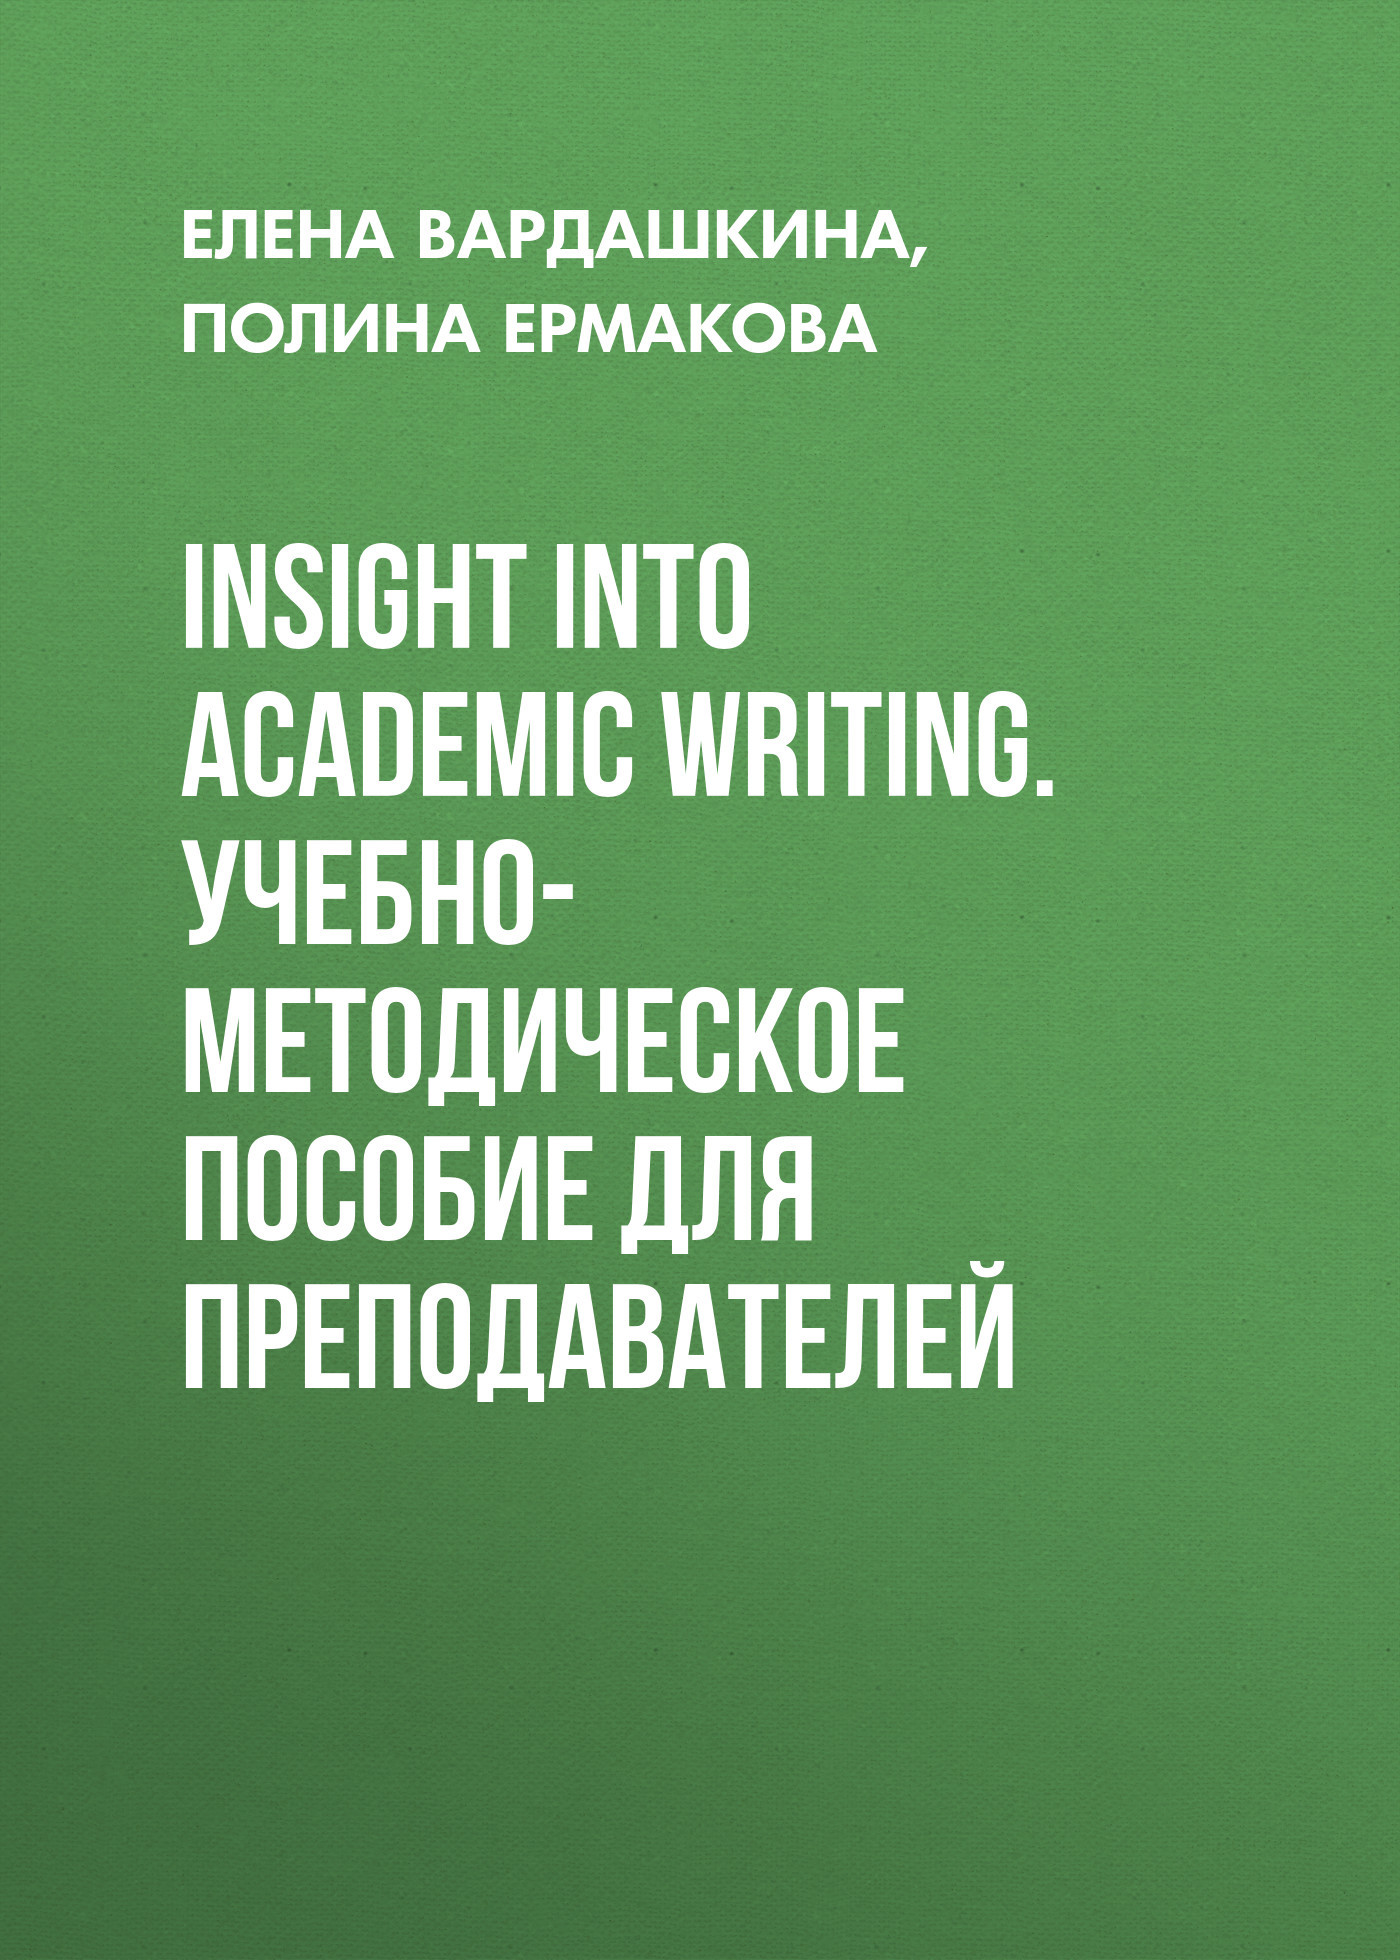 Елена Вардашкина Insight Into Academic Writing. Учебно-методическое пособие для преподавателей